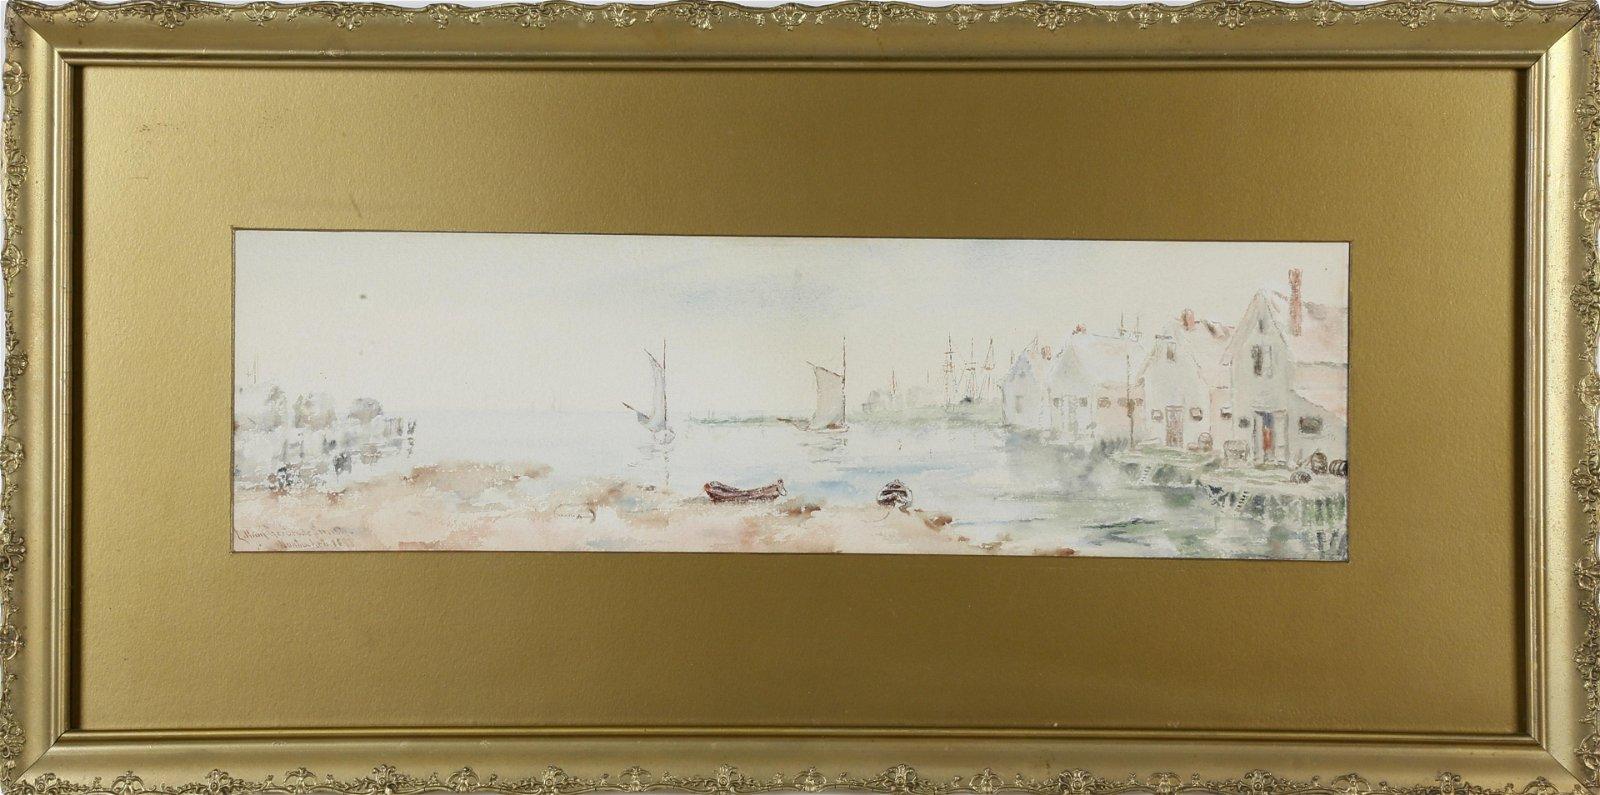 "Lillian Gertrude Smith - ""Old North Wharf"